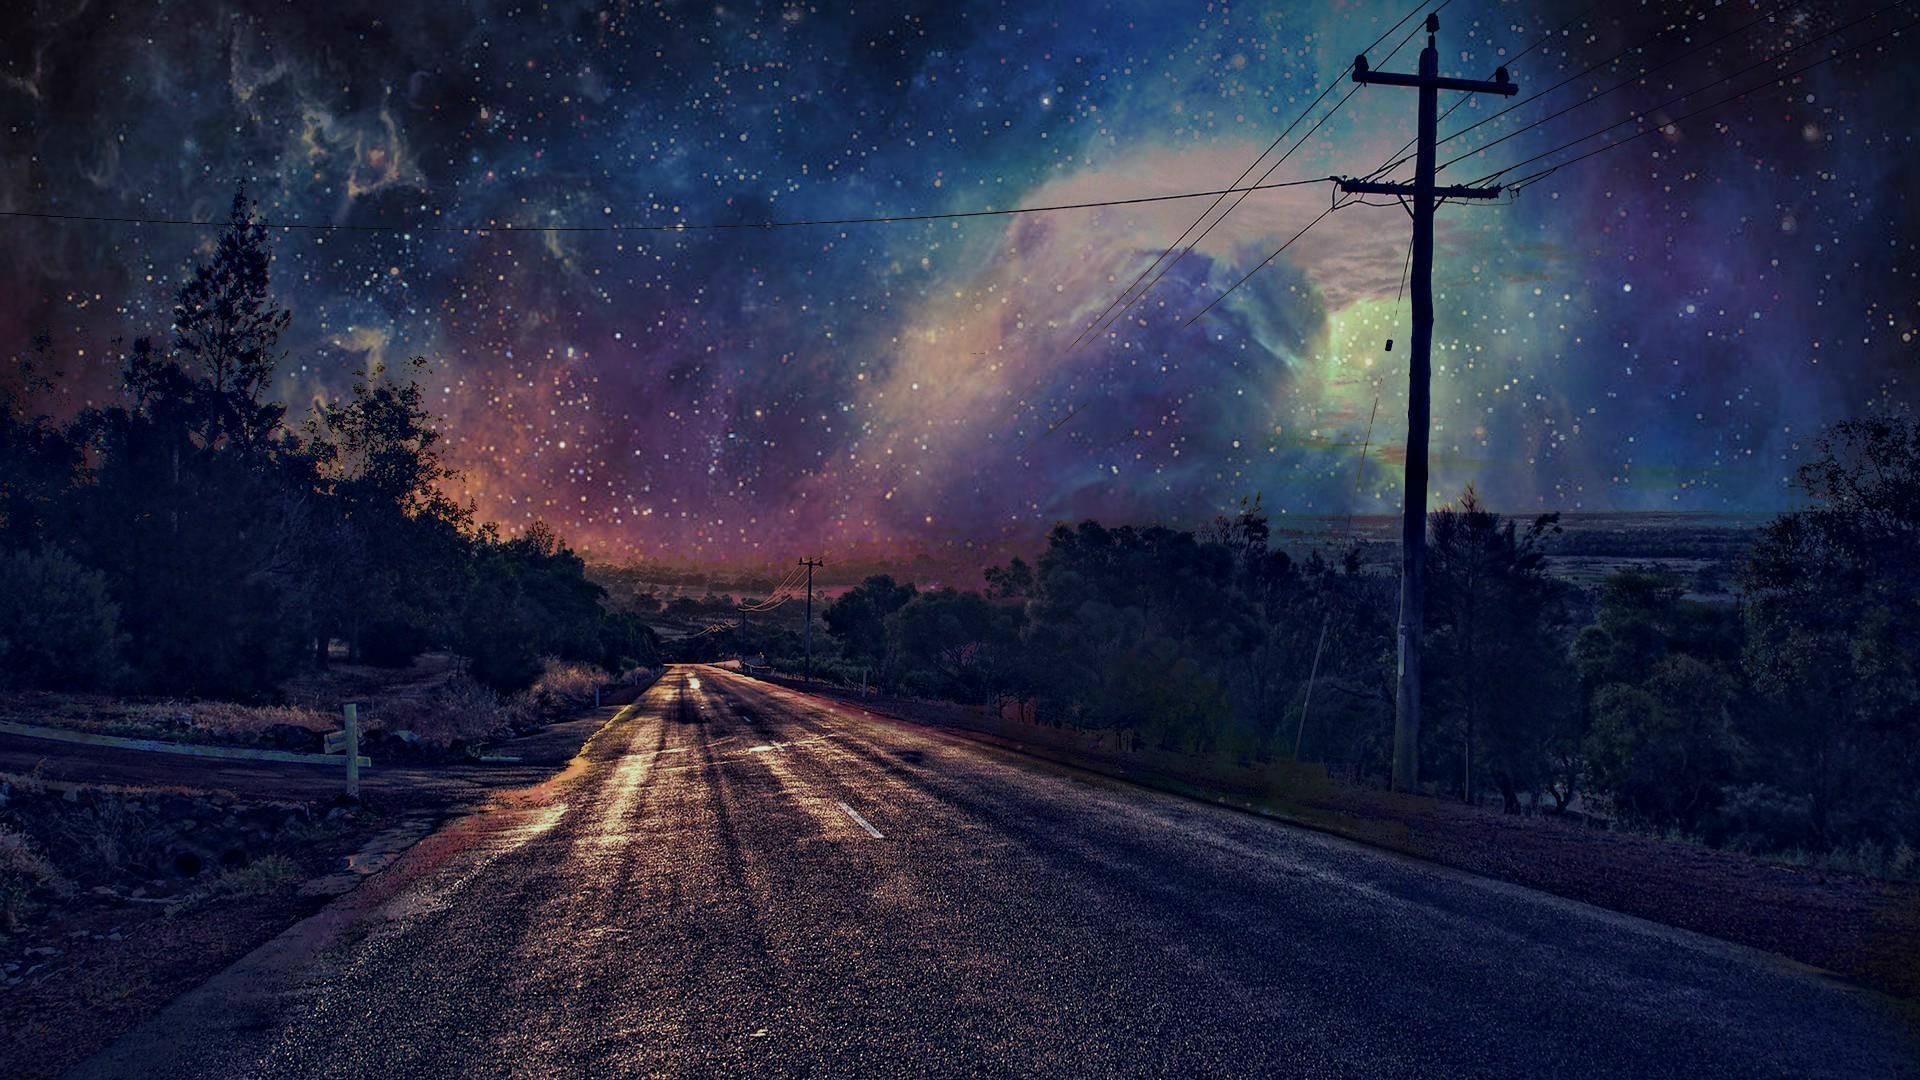 Wallpaper night road stars atmosphere utility pole - Anime scenery wallpaper laptop ...